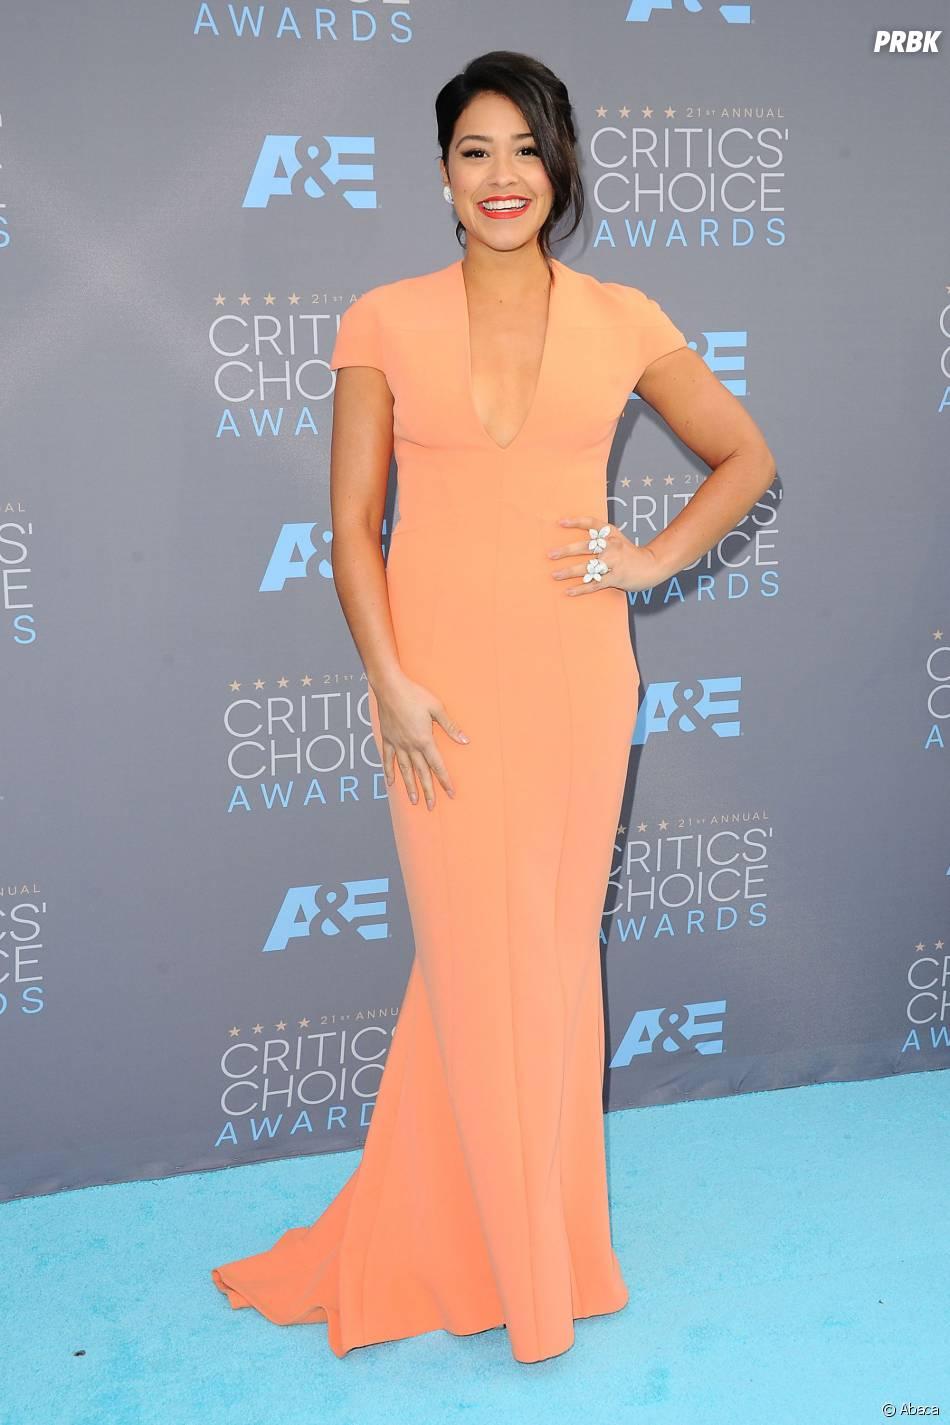 Critics Choice Awards du 17 janvier 2016 : Gina Rodriguez